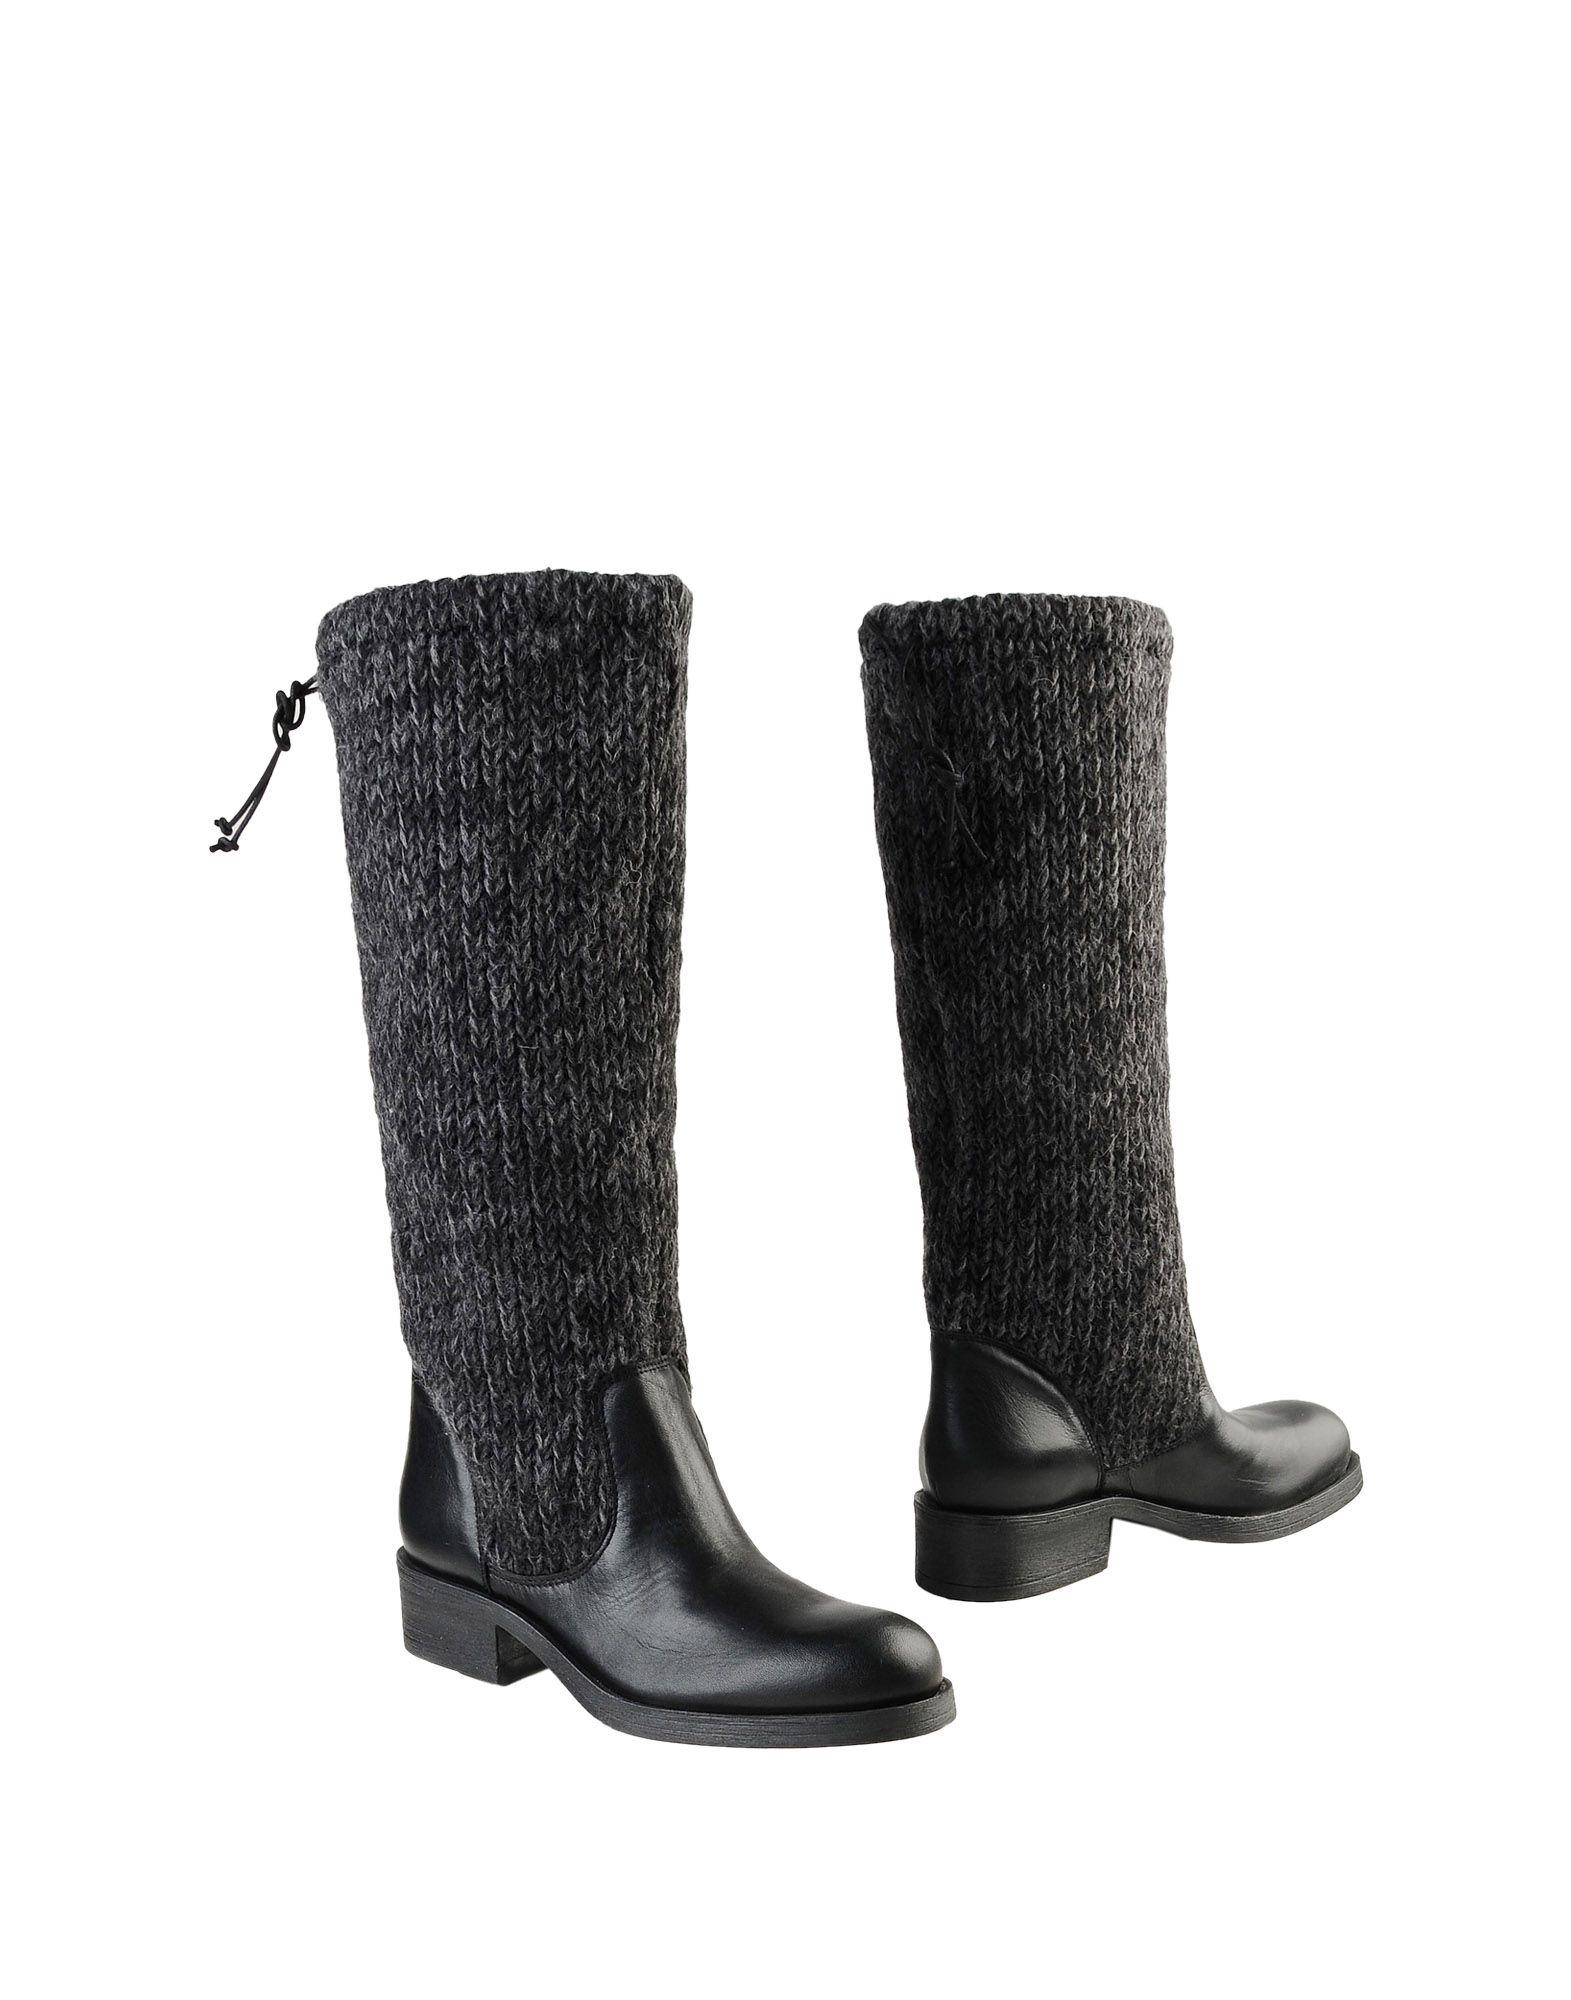 Stilvolle billige Stiefel Schuhe George J. Love Stiefel billige Damen  11537766WB d73439